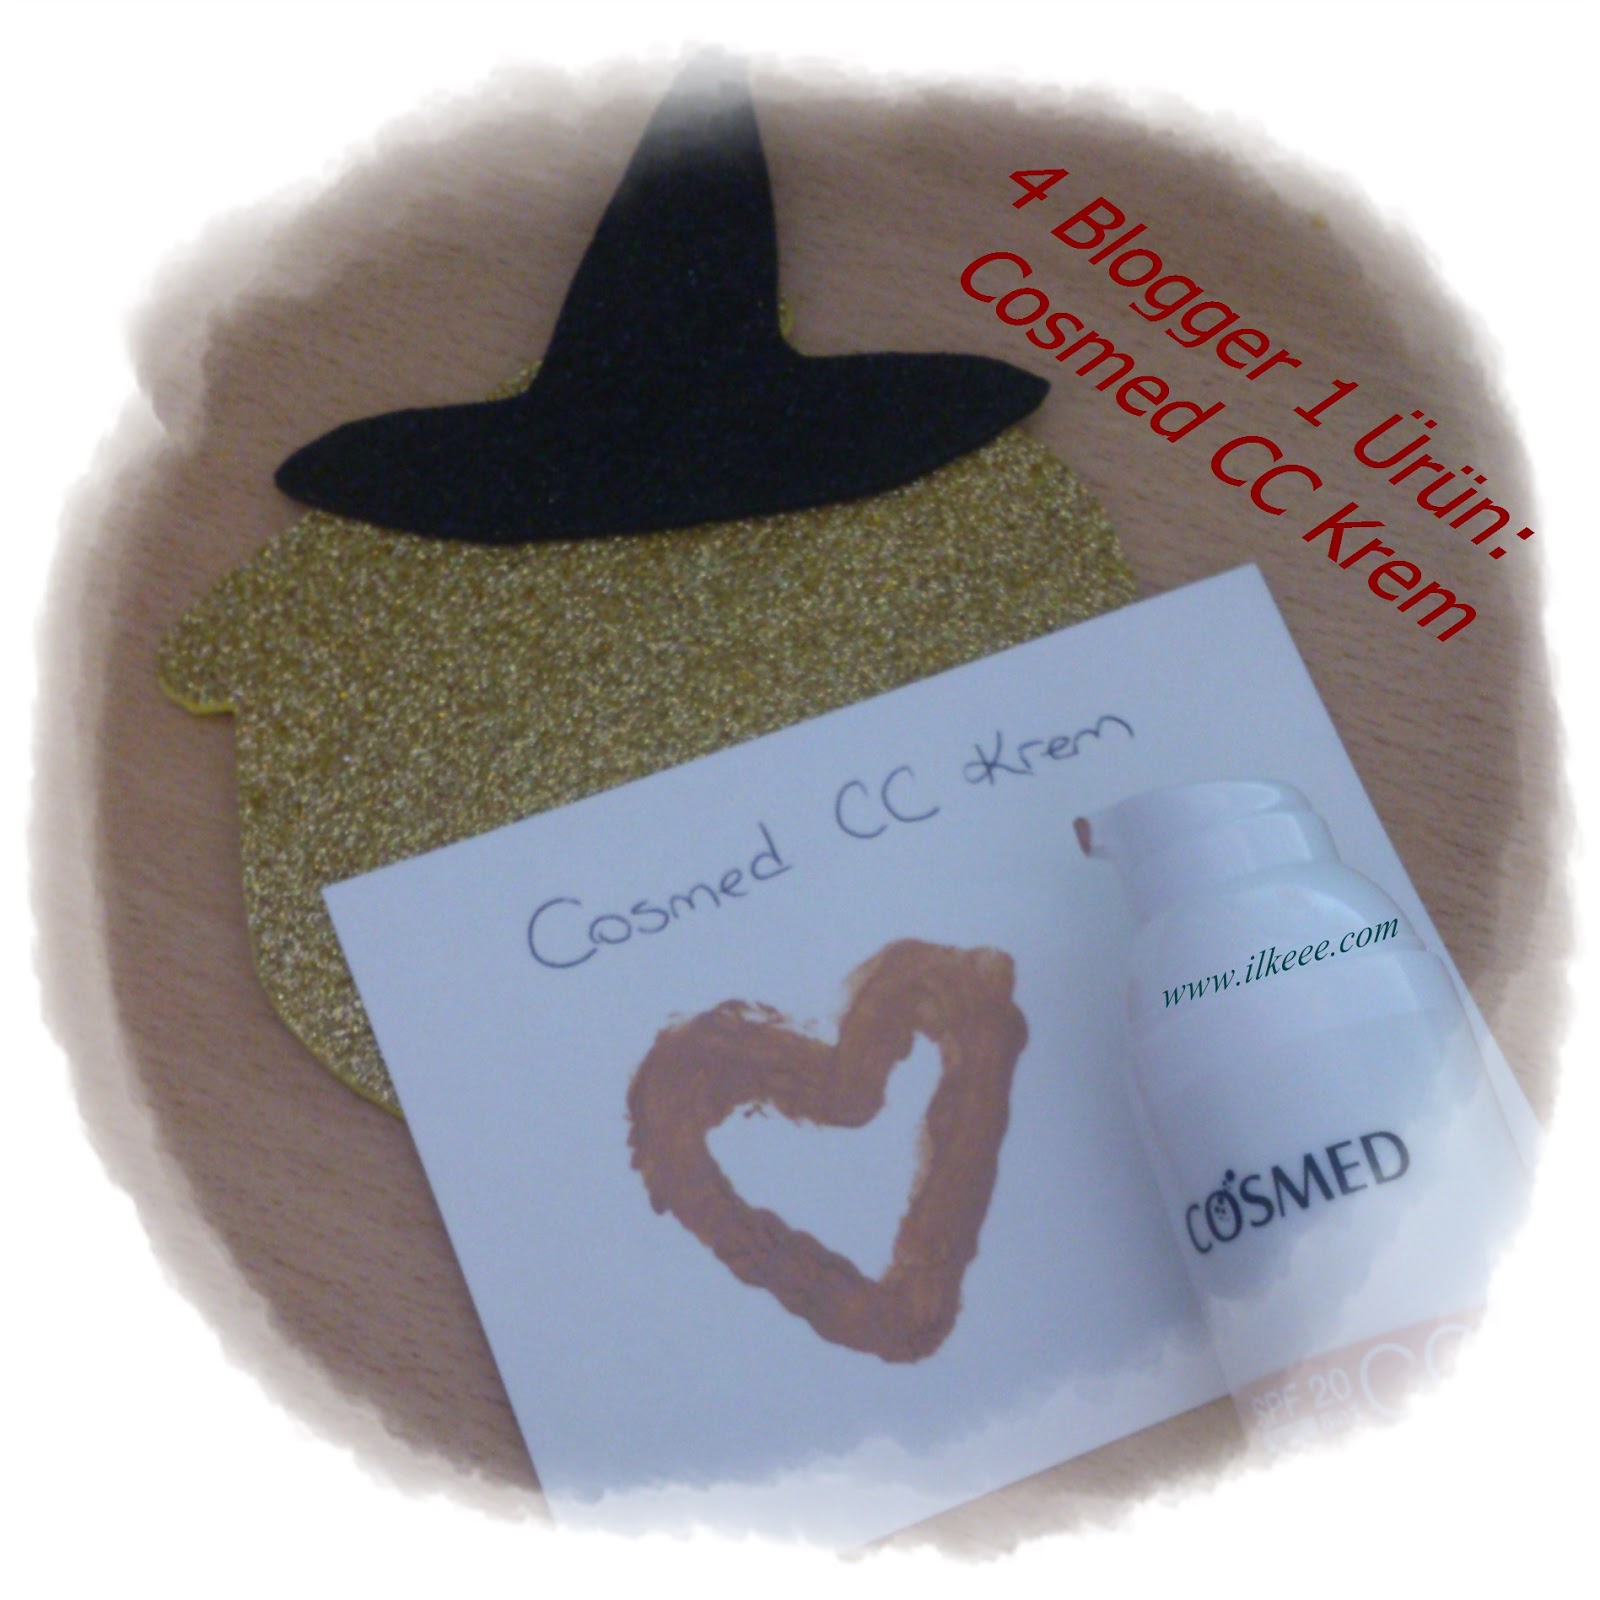 Cosmed - Cosmed CC Krem - Cosmed ultrasense Colour Correcting Cream - Cosmed CC Krem kullananlar - Cosmed CC Krem deneyimleri